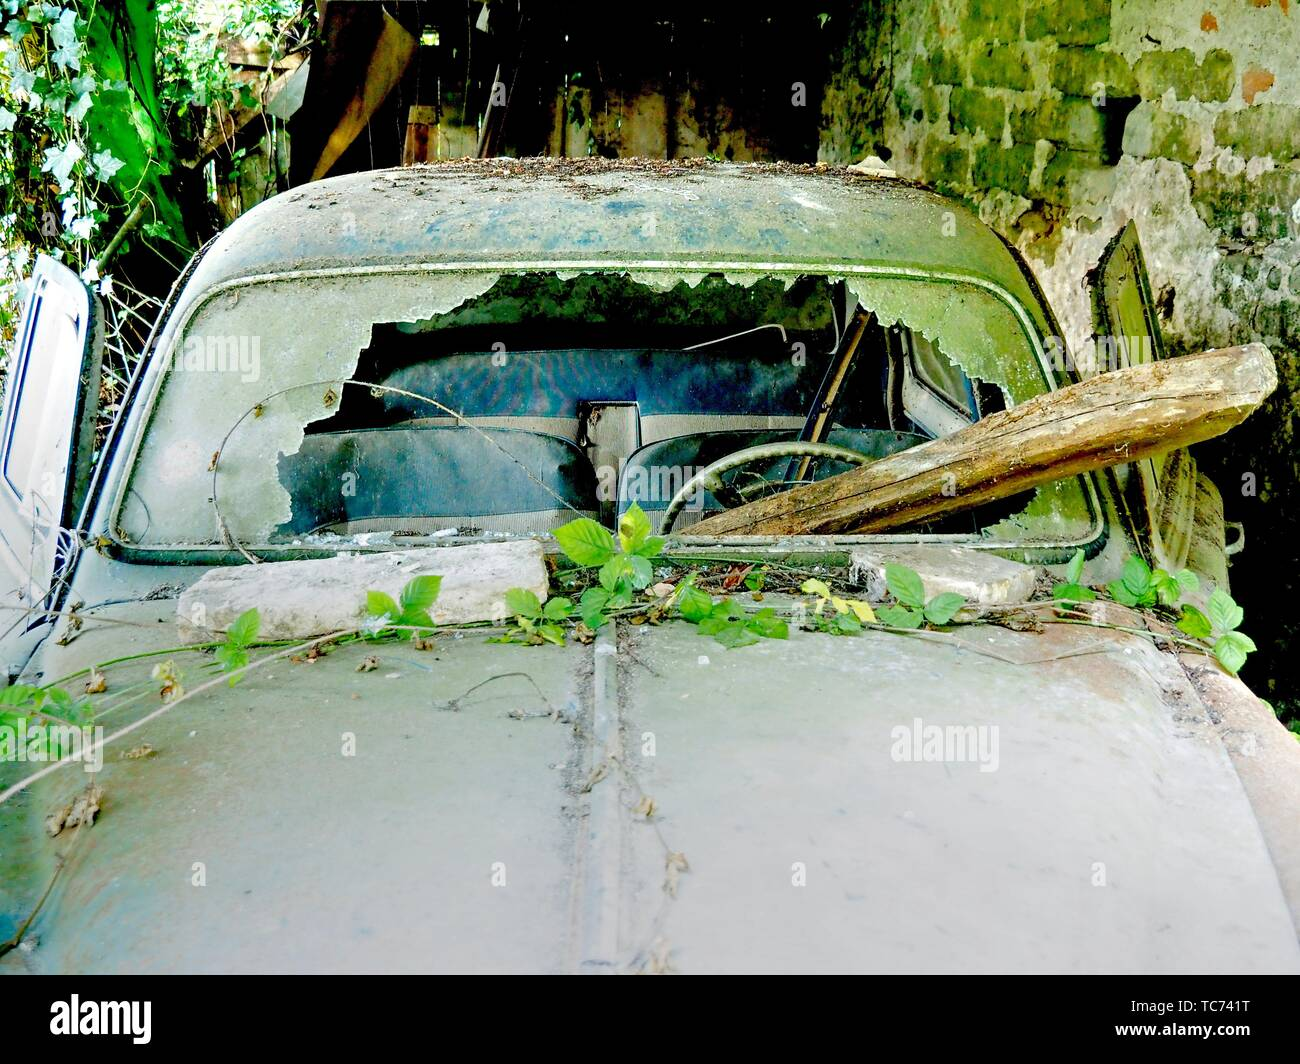 derelict, overgrown Peugeot 403 near Lauzun, Lot-et-Garonne Department, New Aquitaine, France. - Stock Image